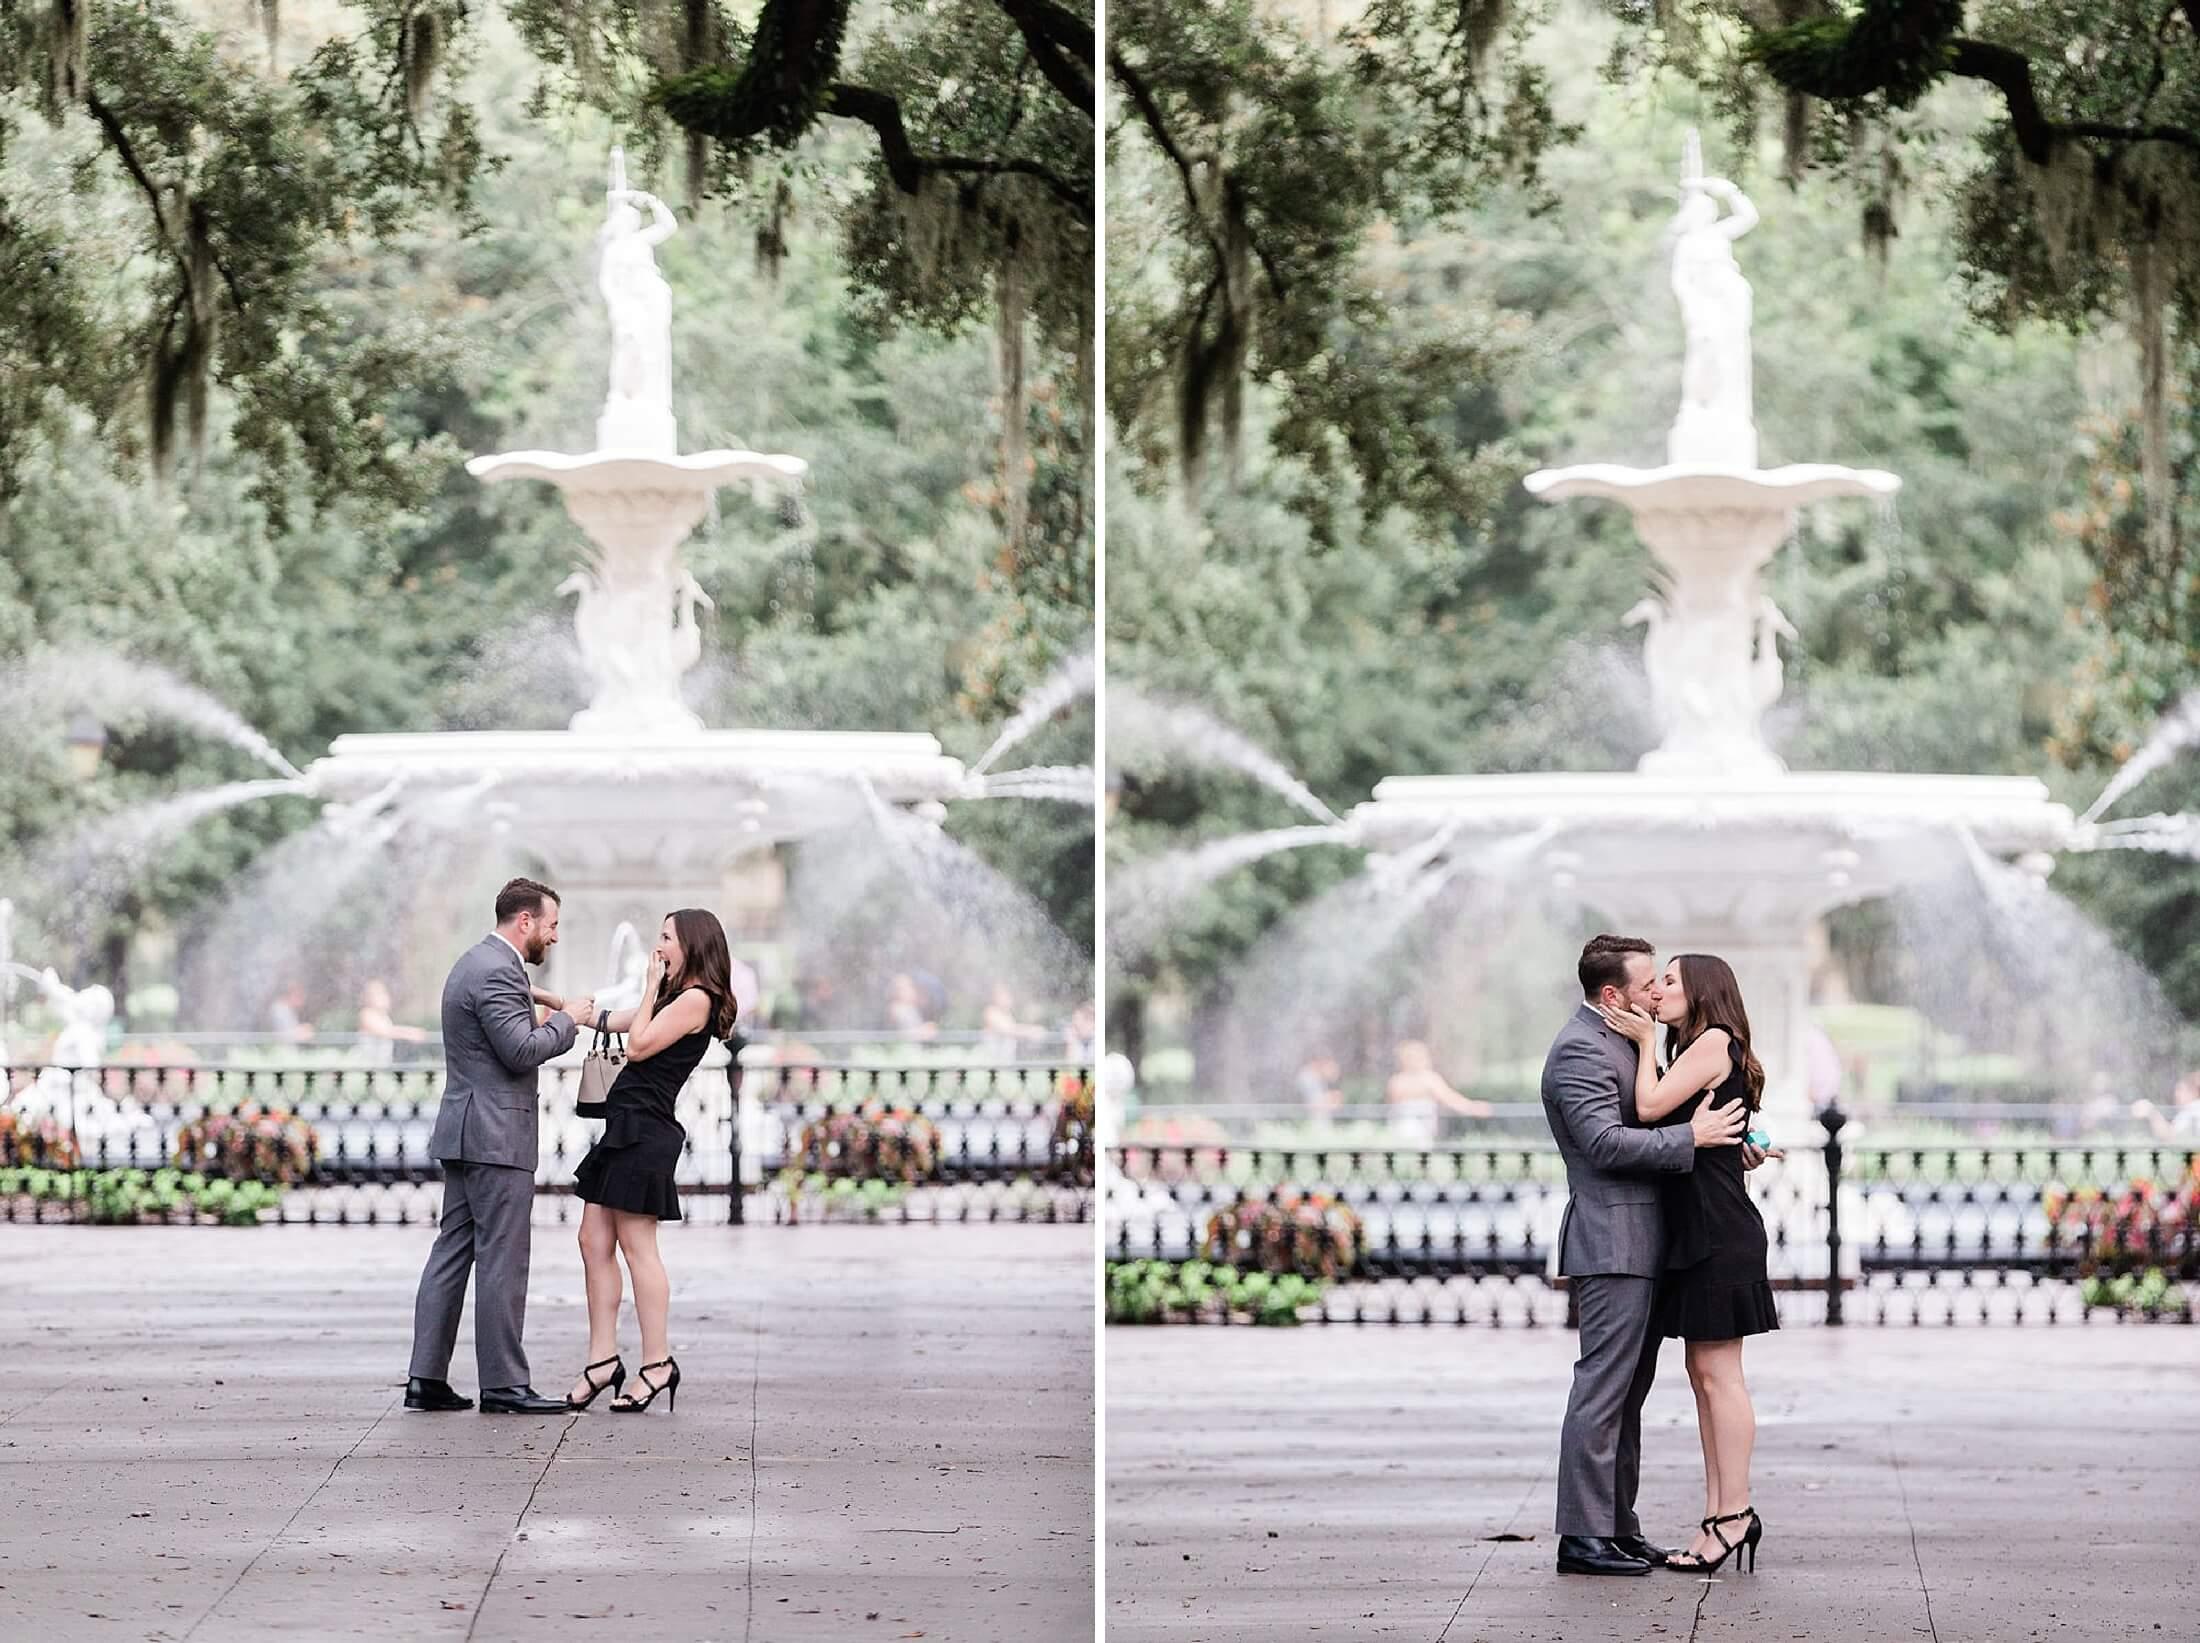 Apt-b-photography-savannah-proposal-photographer-savannah-wedding-forsyth-fountain-proposal-12.jpg